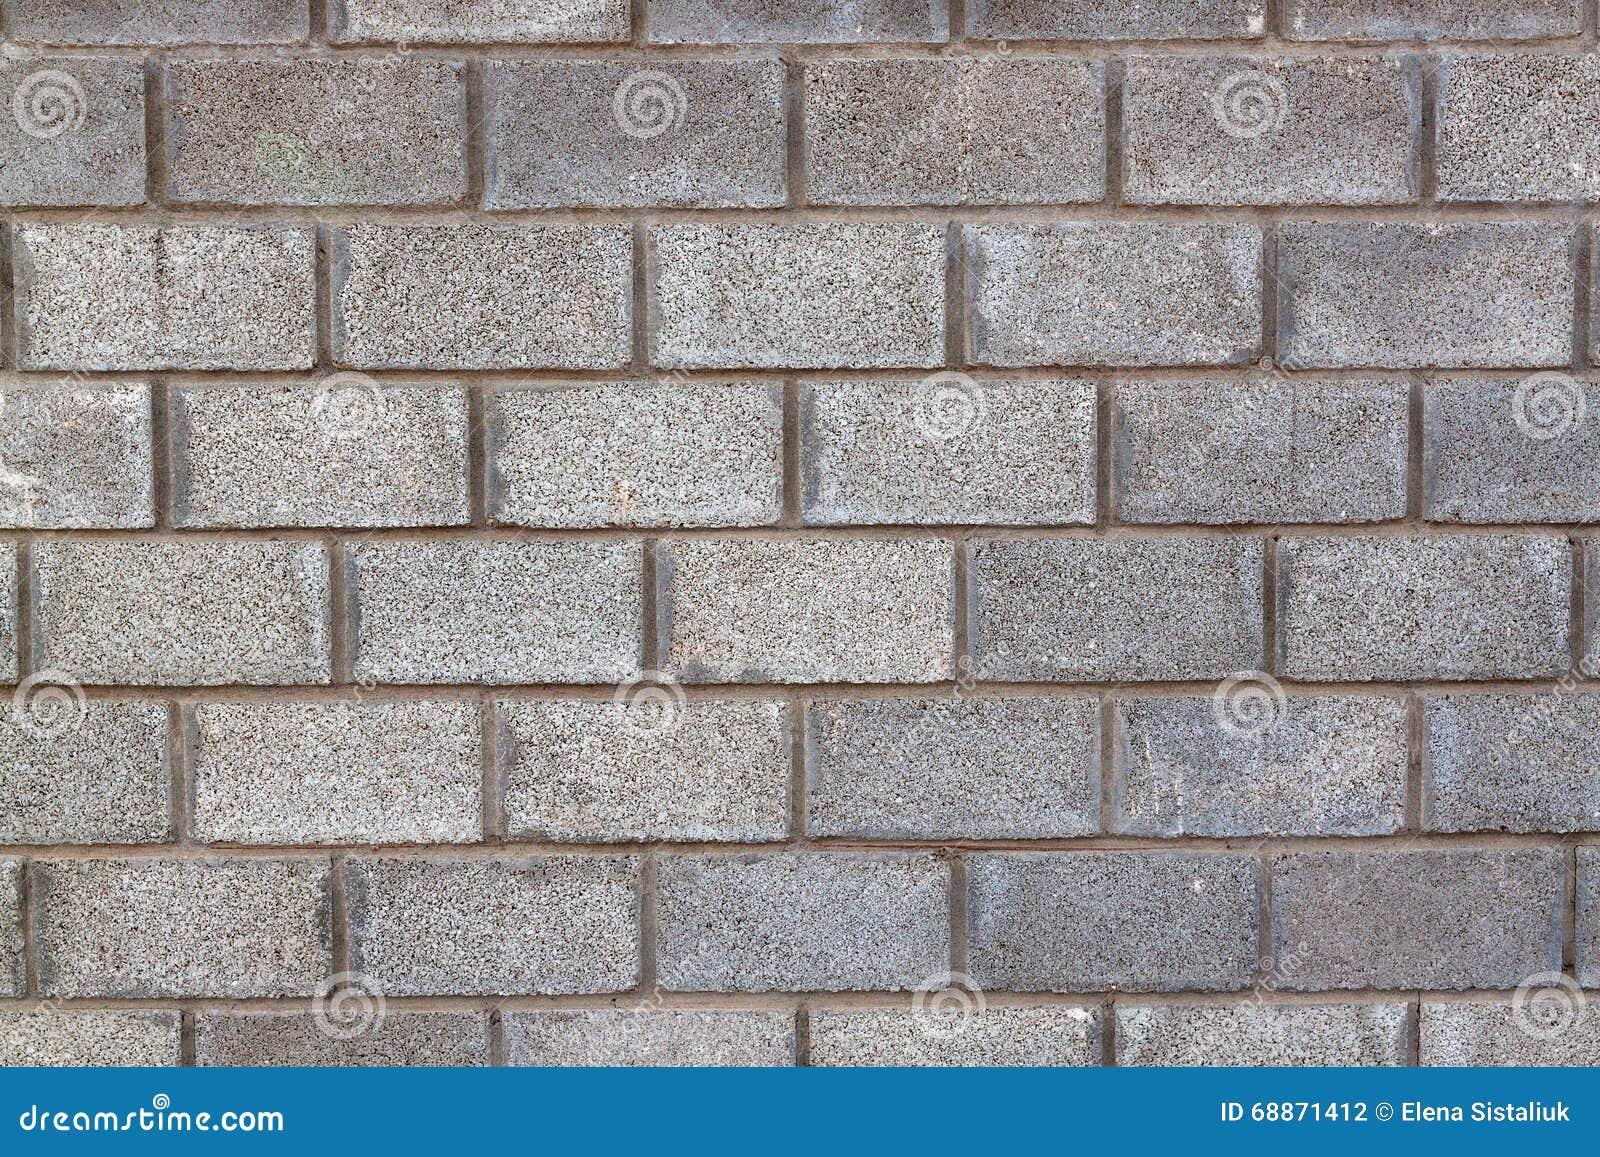 Bloques de cemento grises pared textura del fondo foto de archivo imagen 68871412 - Paredes de cemento ...